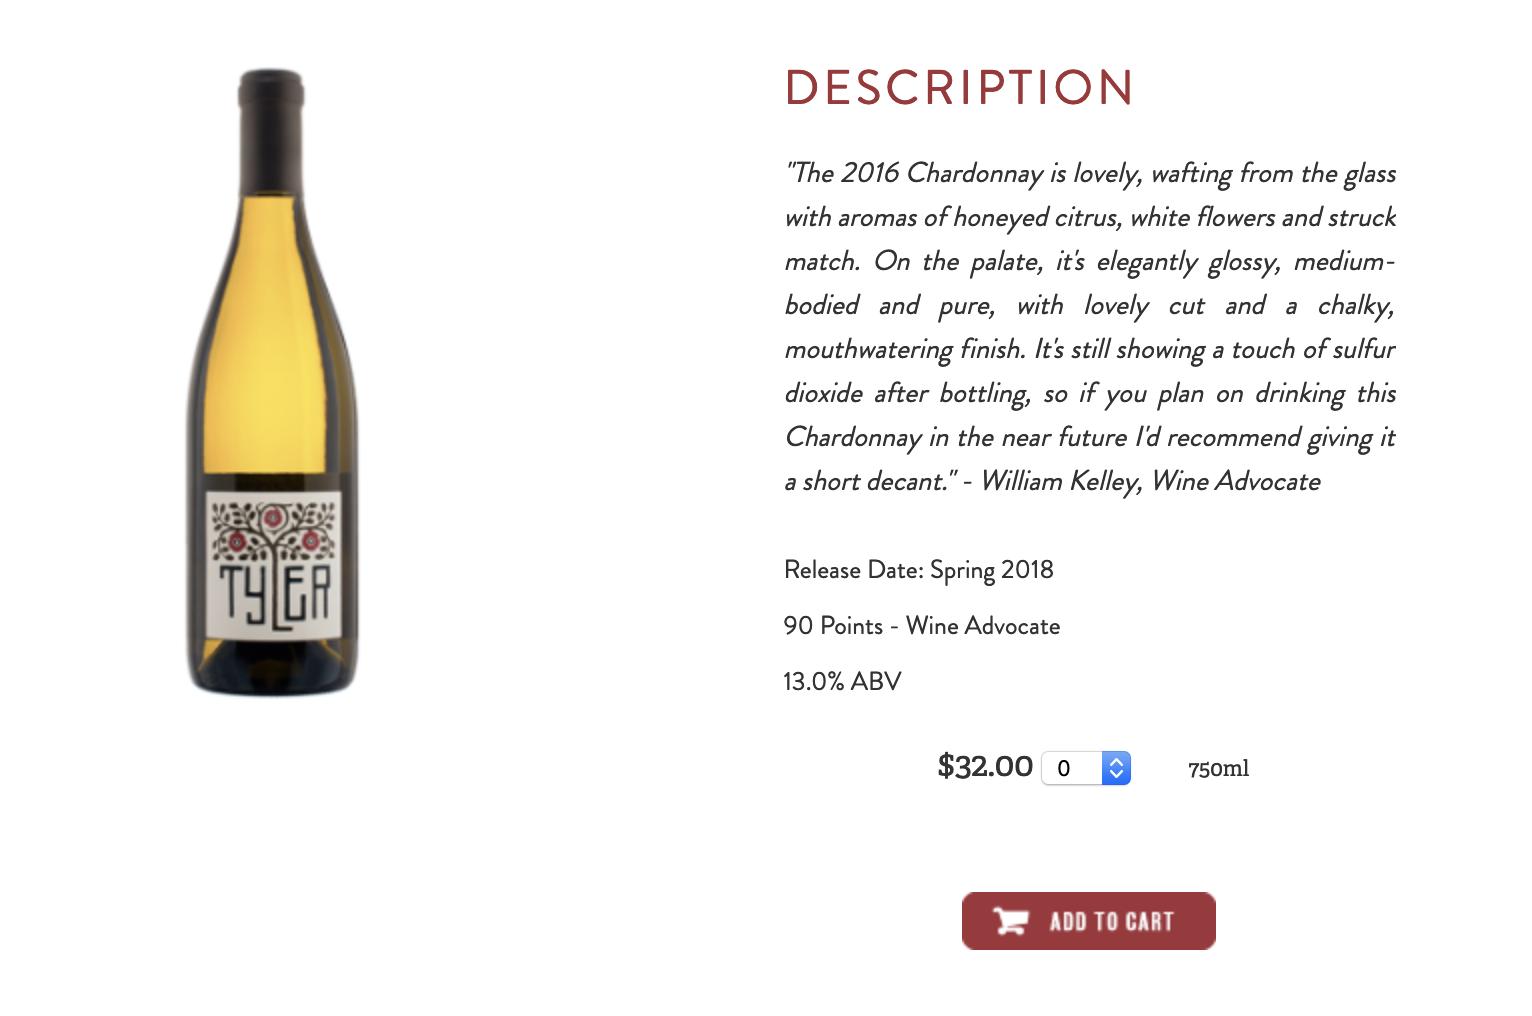 Tyler 2016 Chardonnay